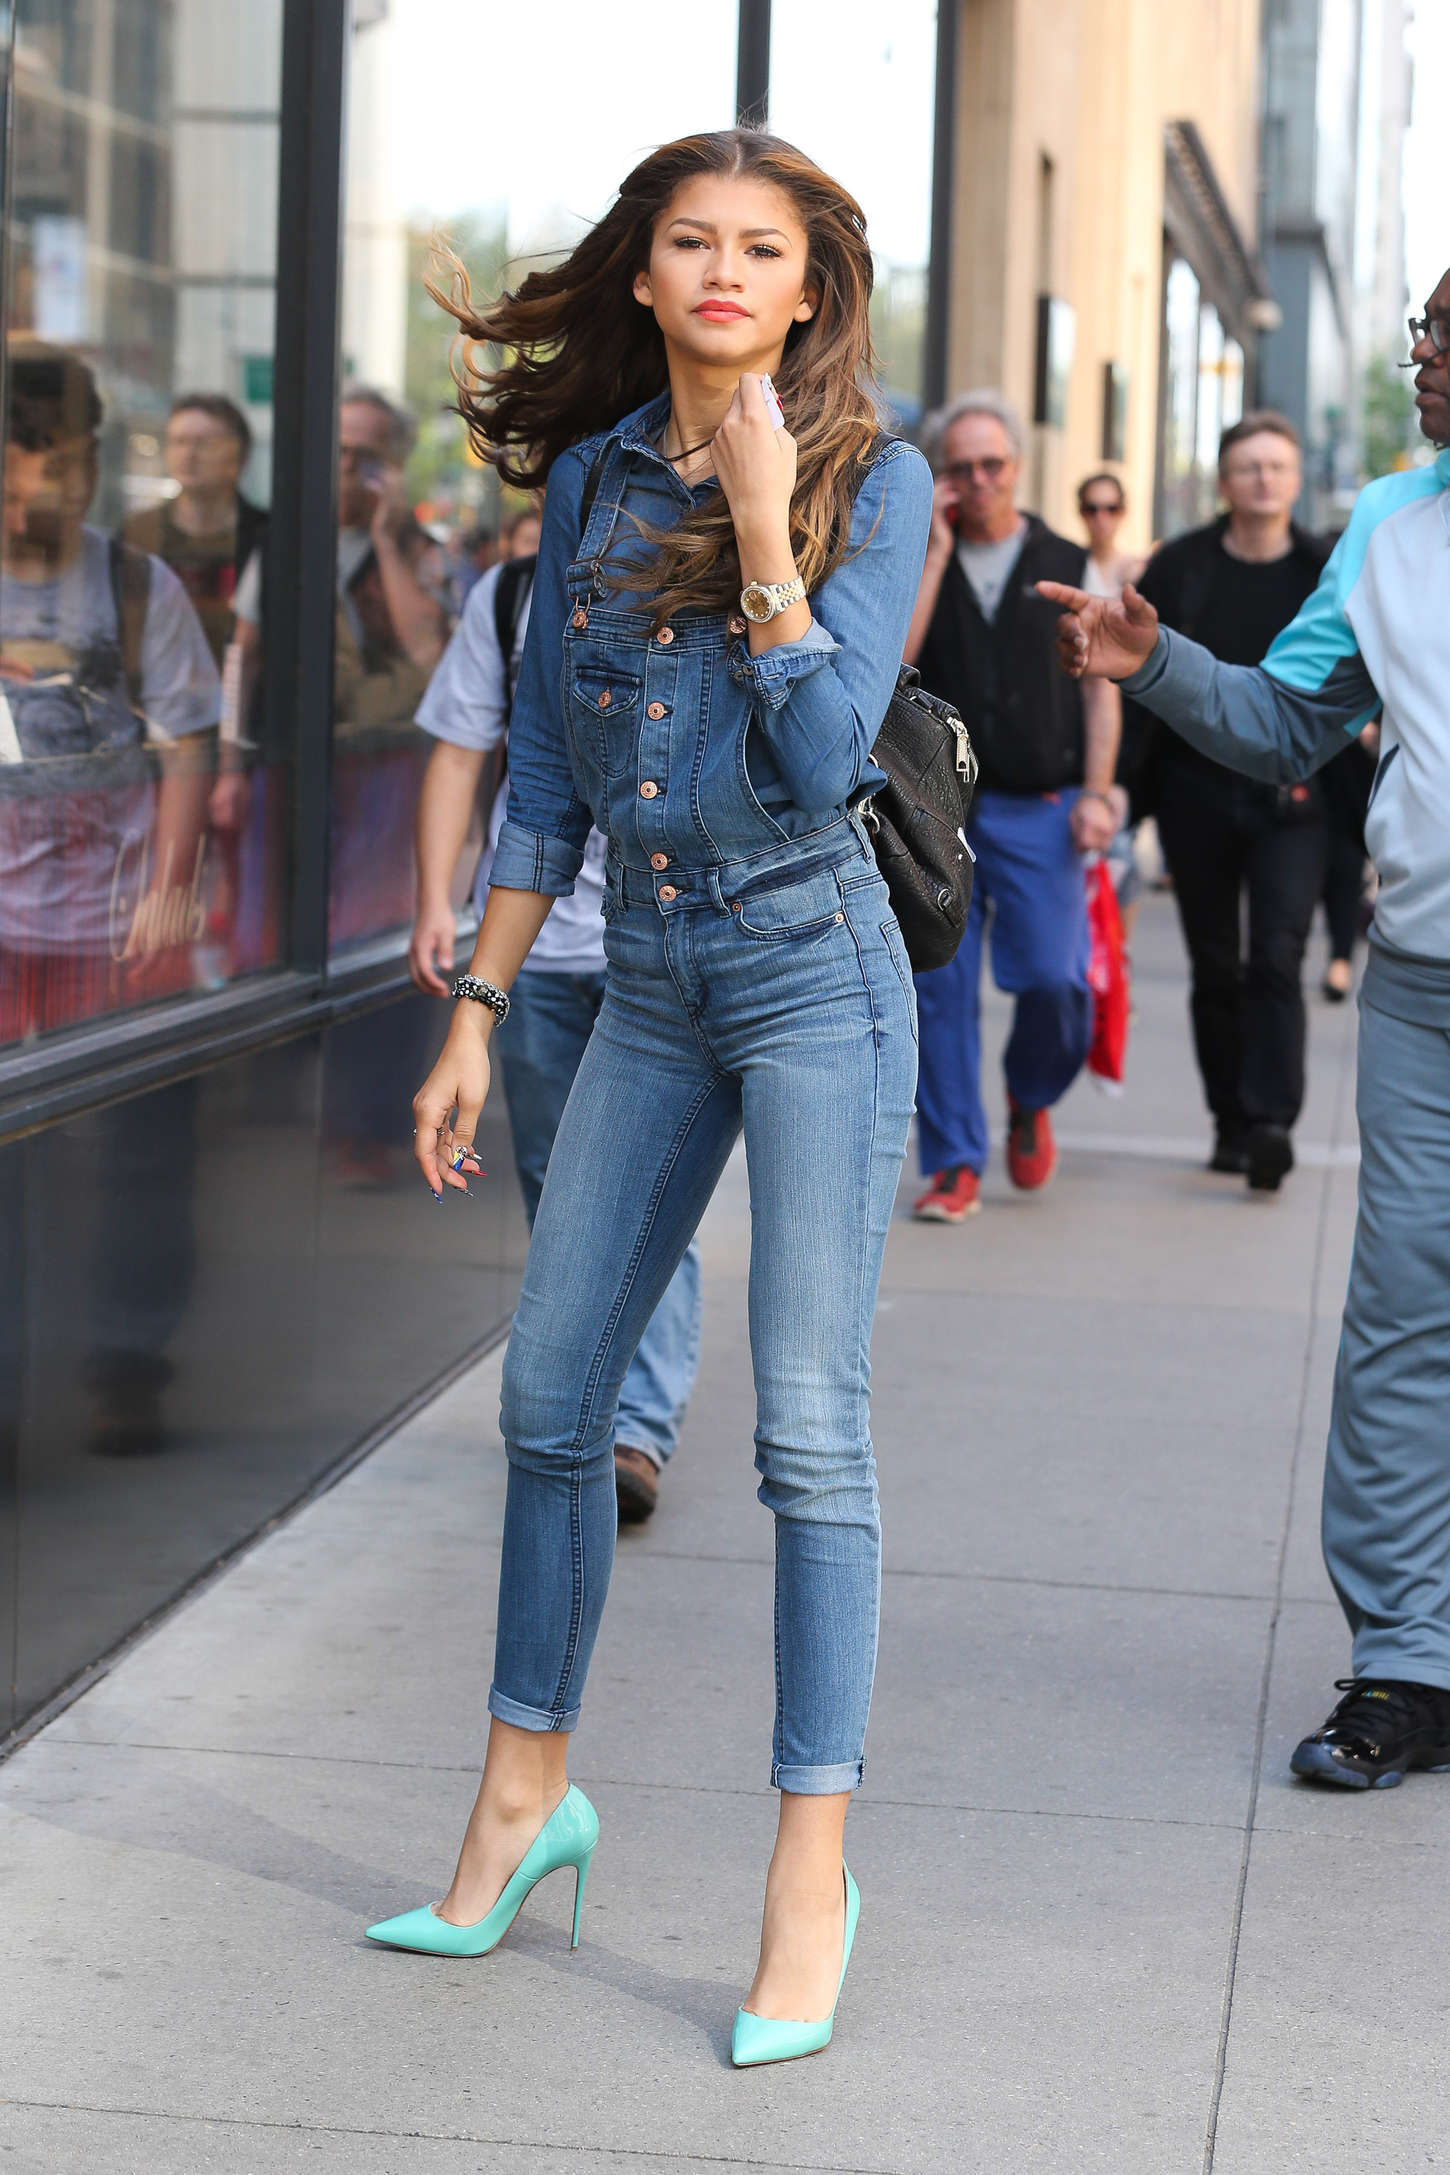 zendaya-coleman-jeans-street-style-111